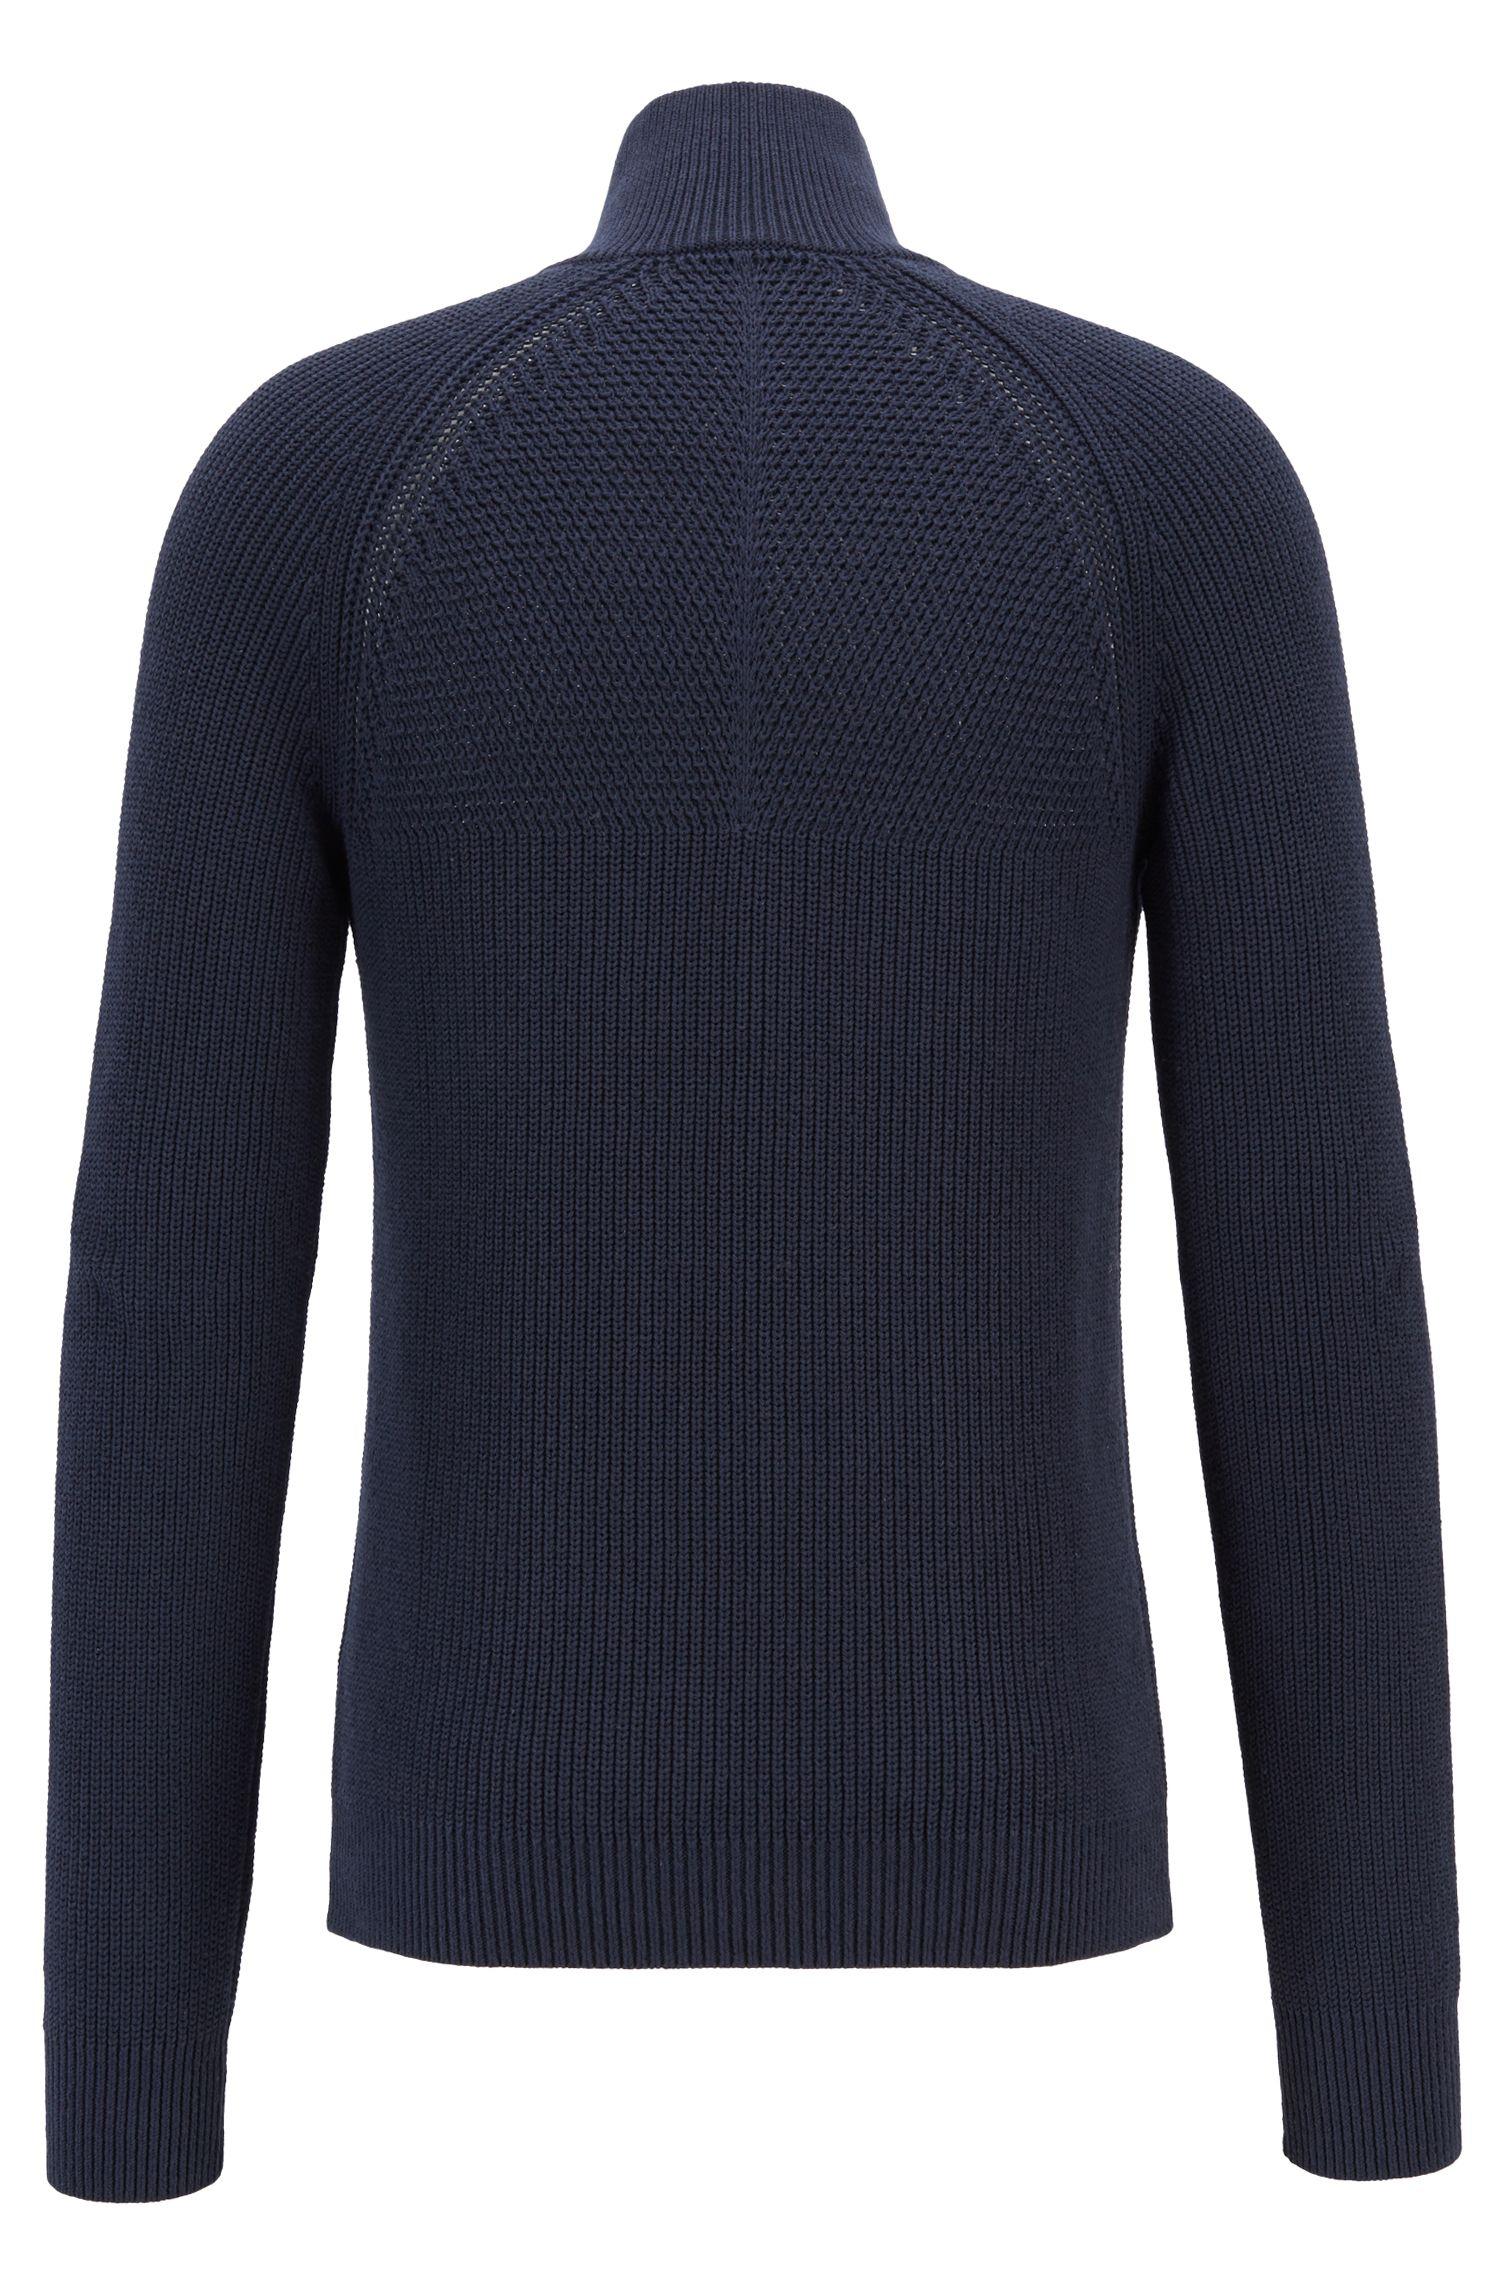 Zipper-neck sweater in half-cardigan rib stitch cotton, Dark Blue